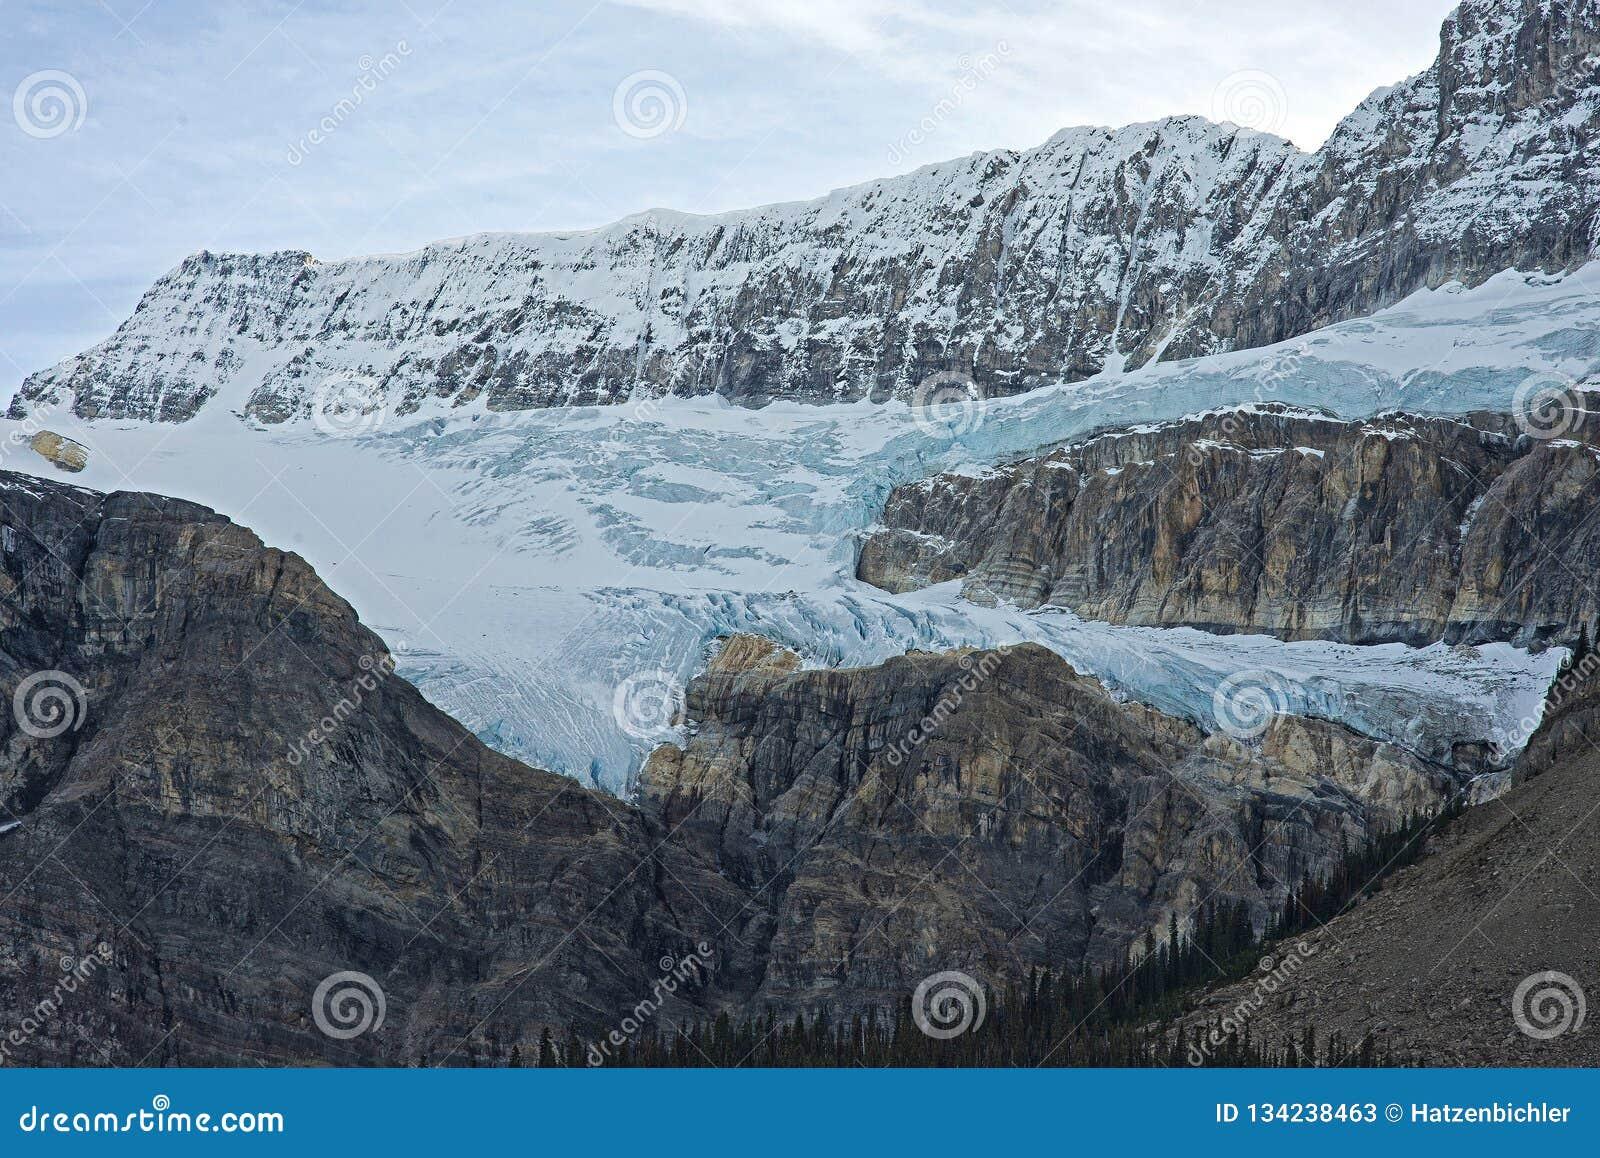 Glacier flowing down a mountain